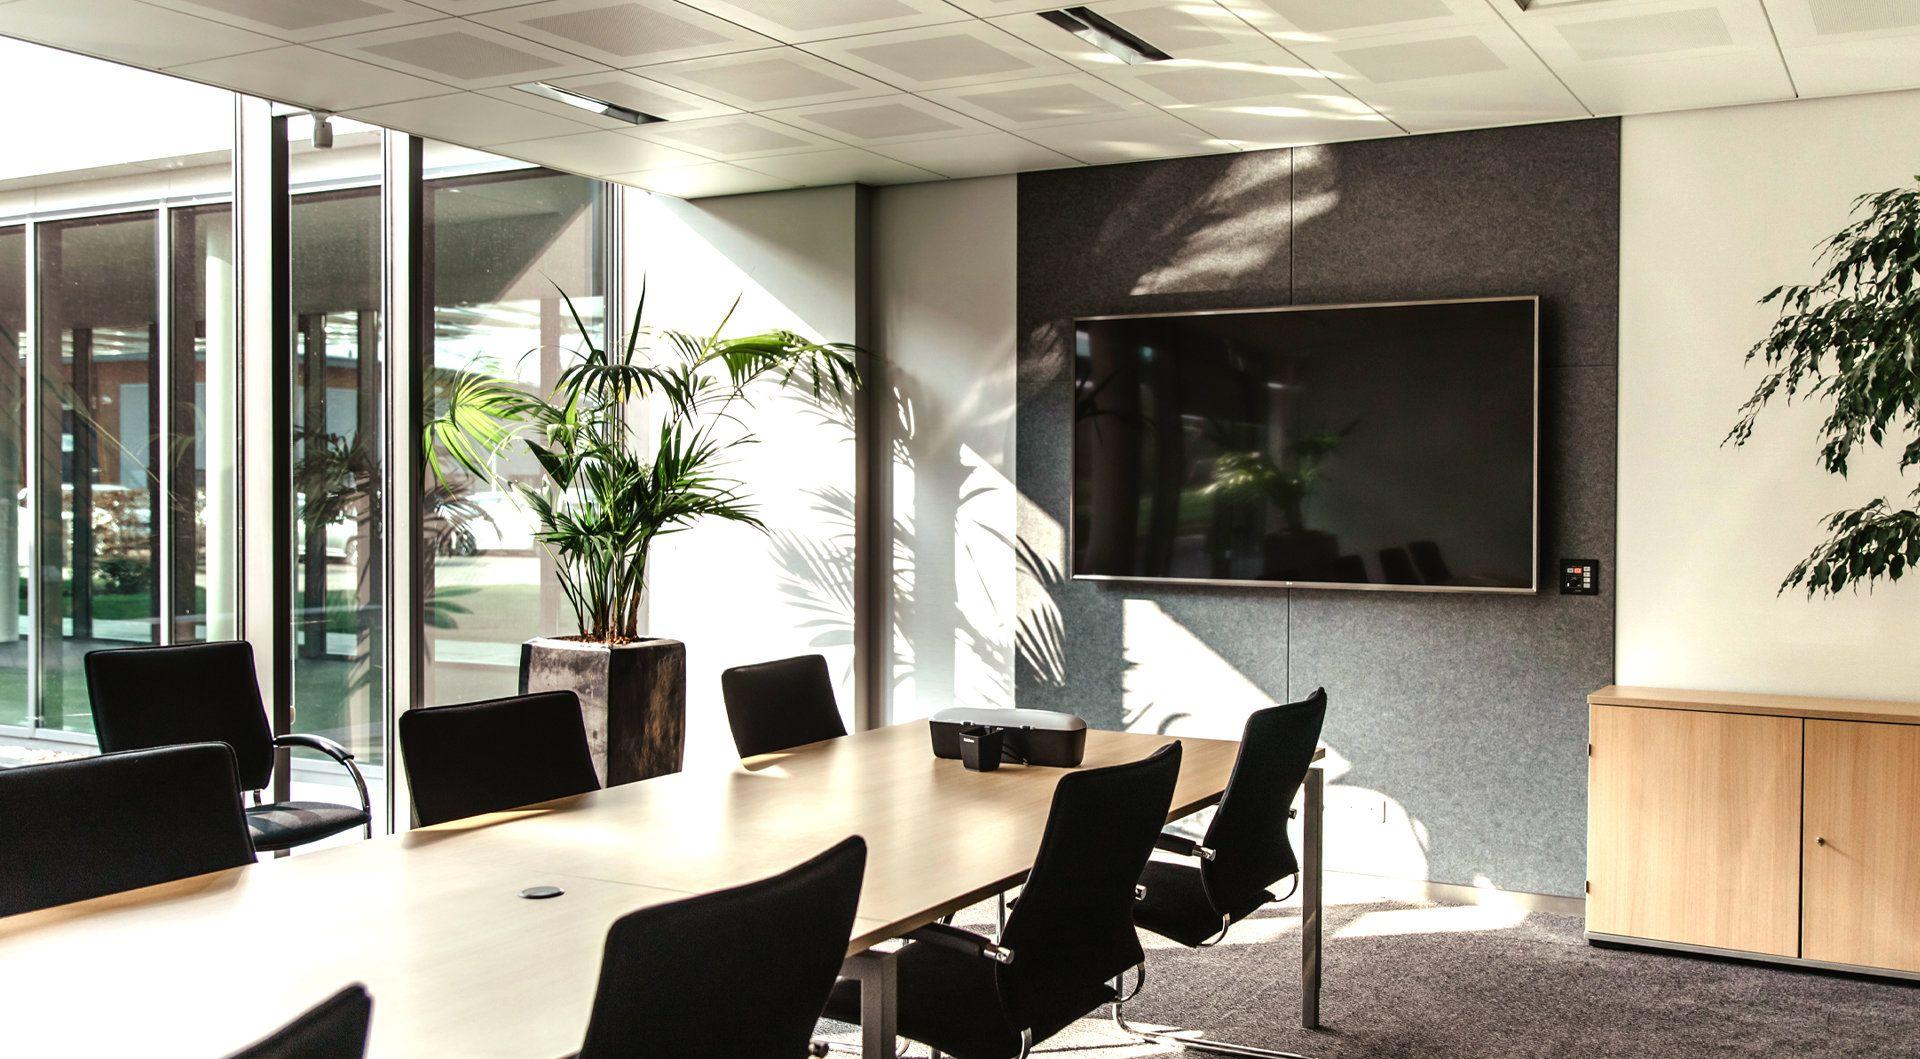 "Chief PNRUB flat panel muur steun 2,18 m (86"") Zwart - Case studie de vries"